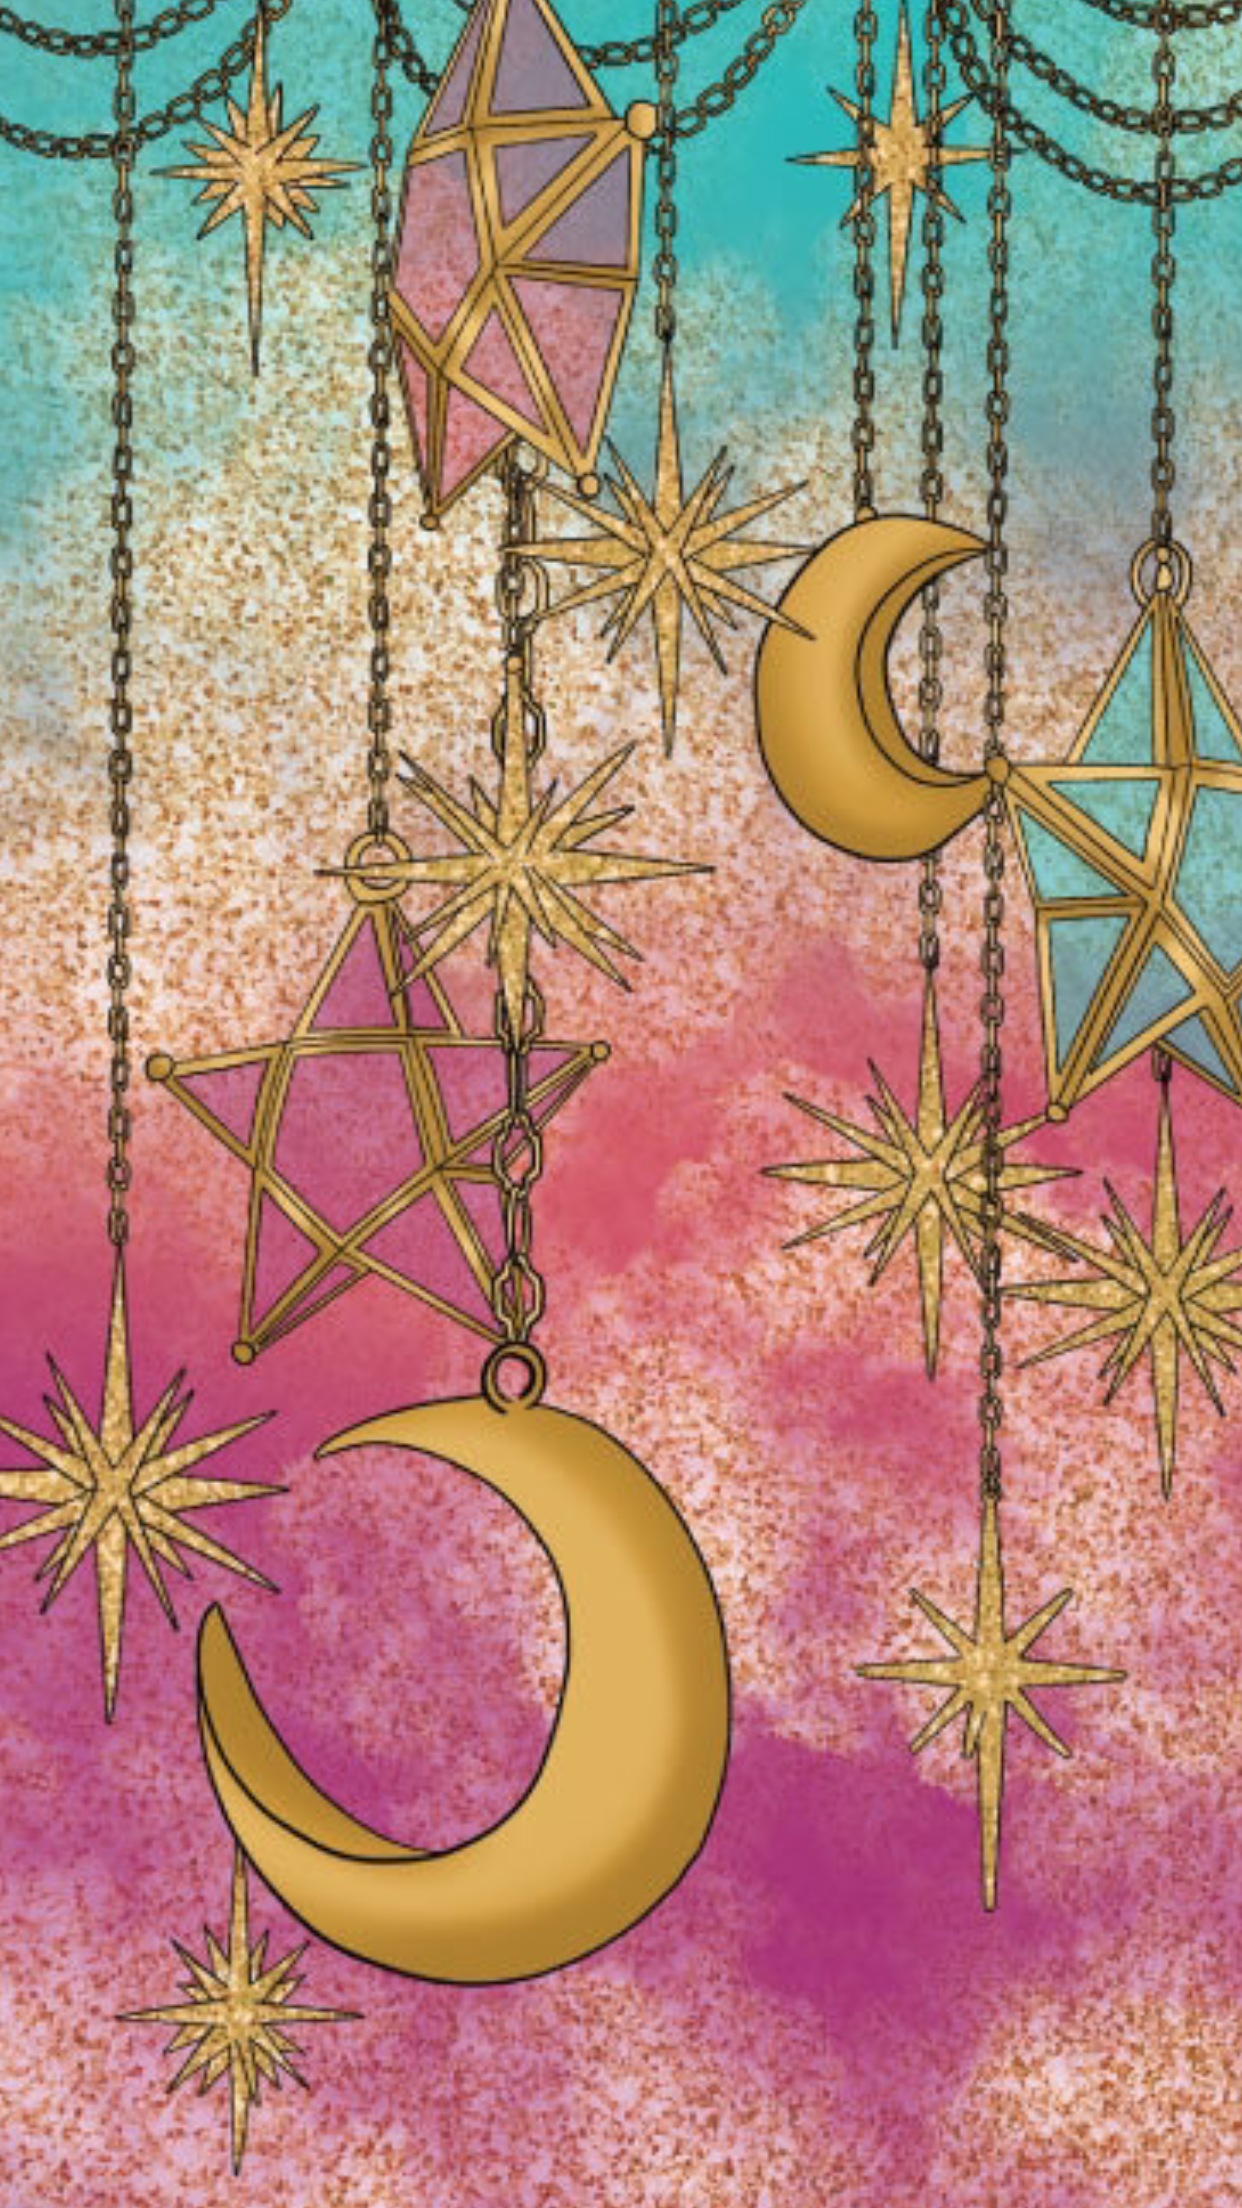 Pin By Savannah Hyde On Phone Screen Wallpapers Witchy Wallpaper Cute Wallpapers Wallpaper Backgrounds